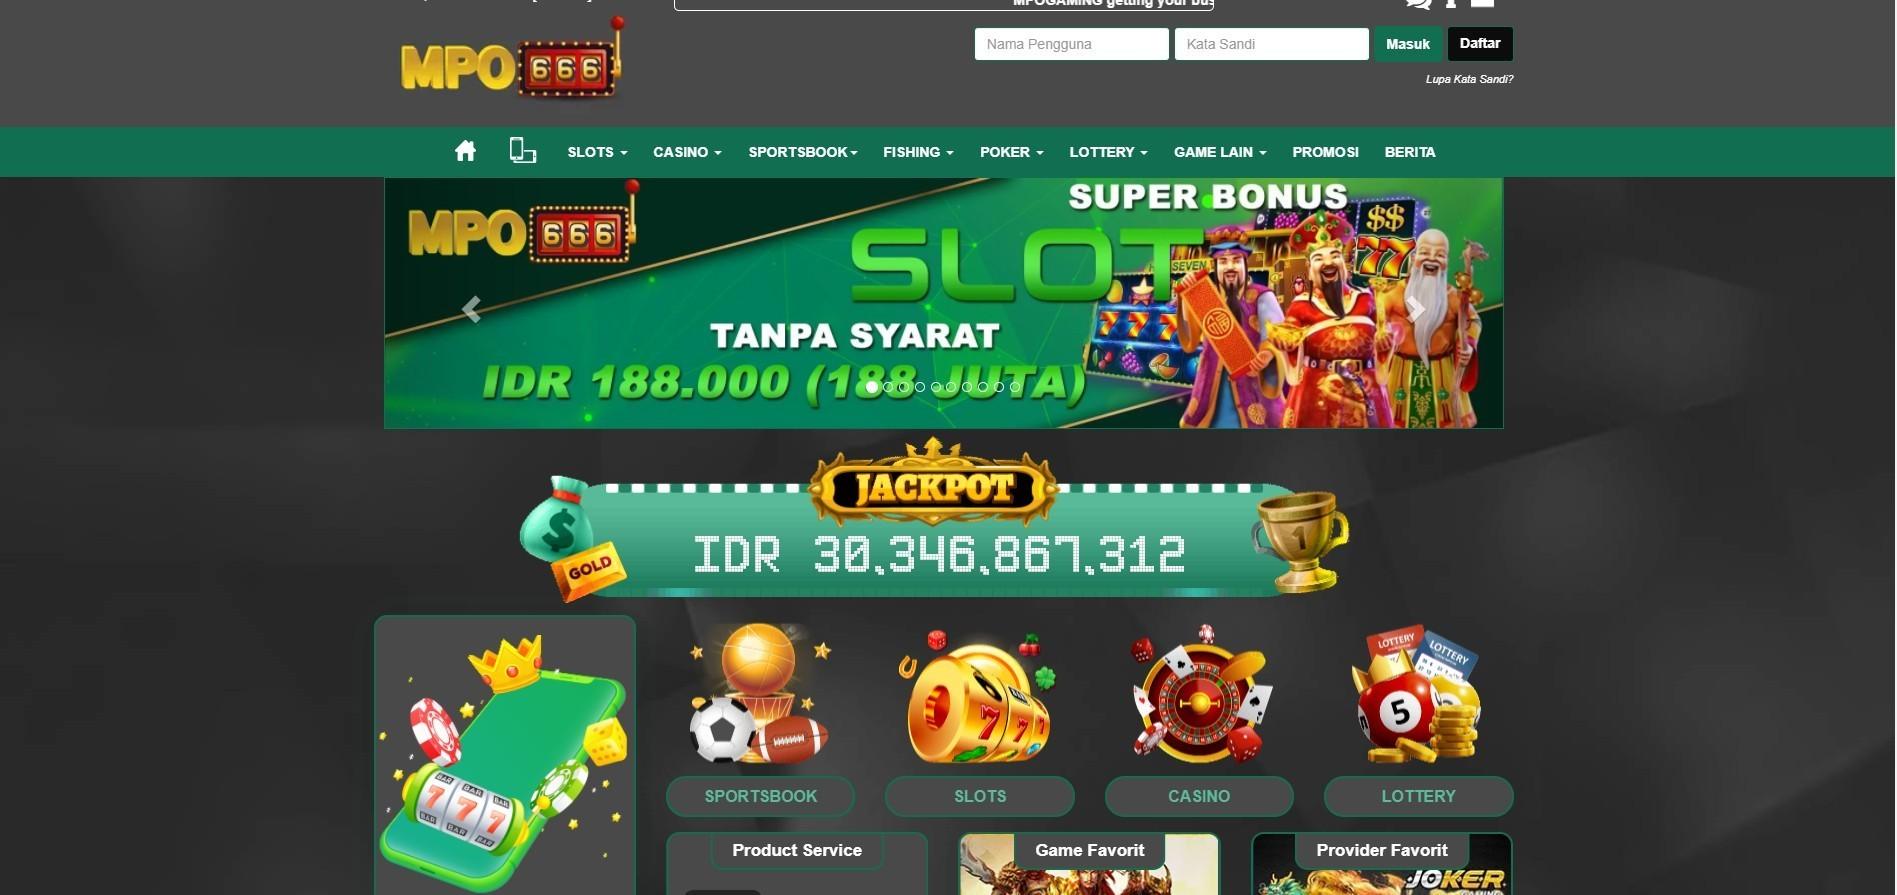 Jual Tiket Mpo666 Slots Online Terlengkap Indonesia 2020 Loket Com